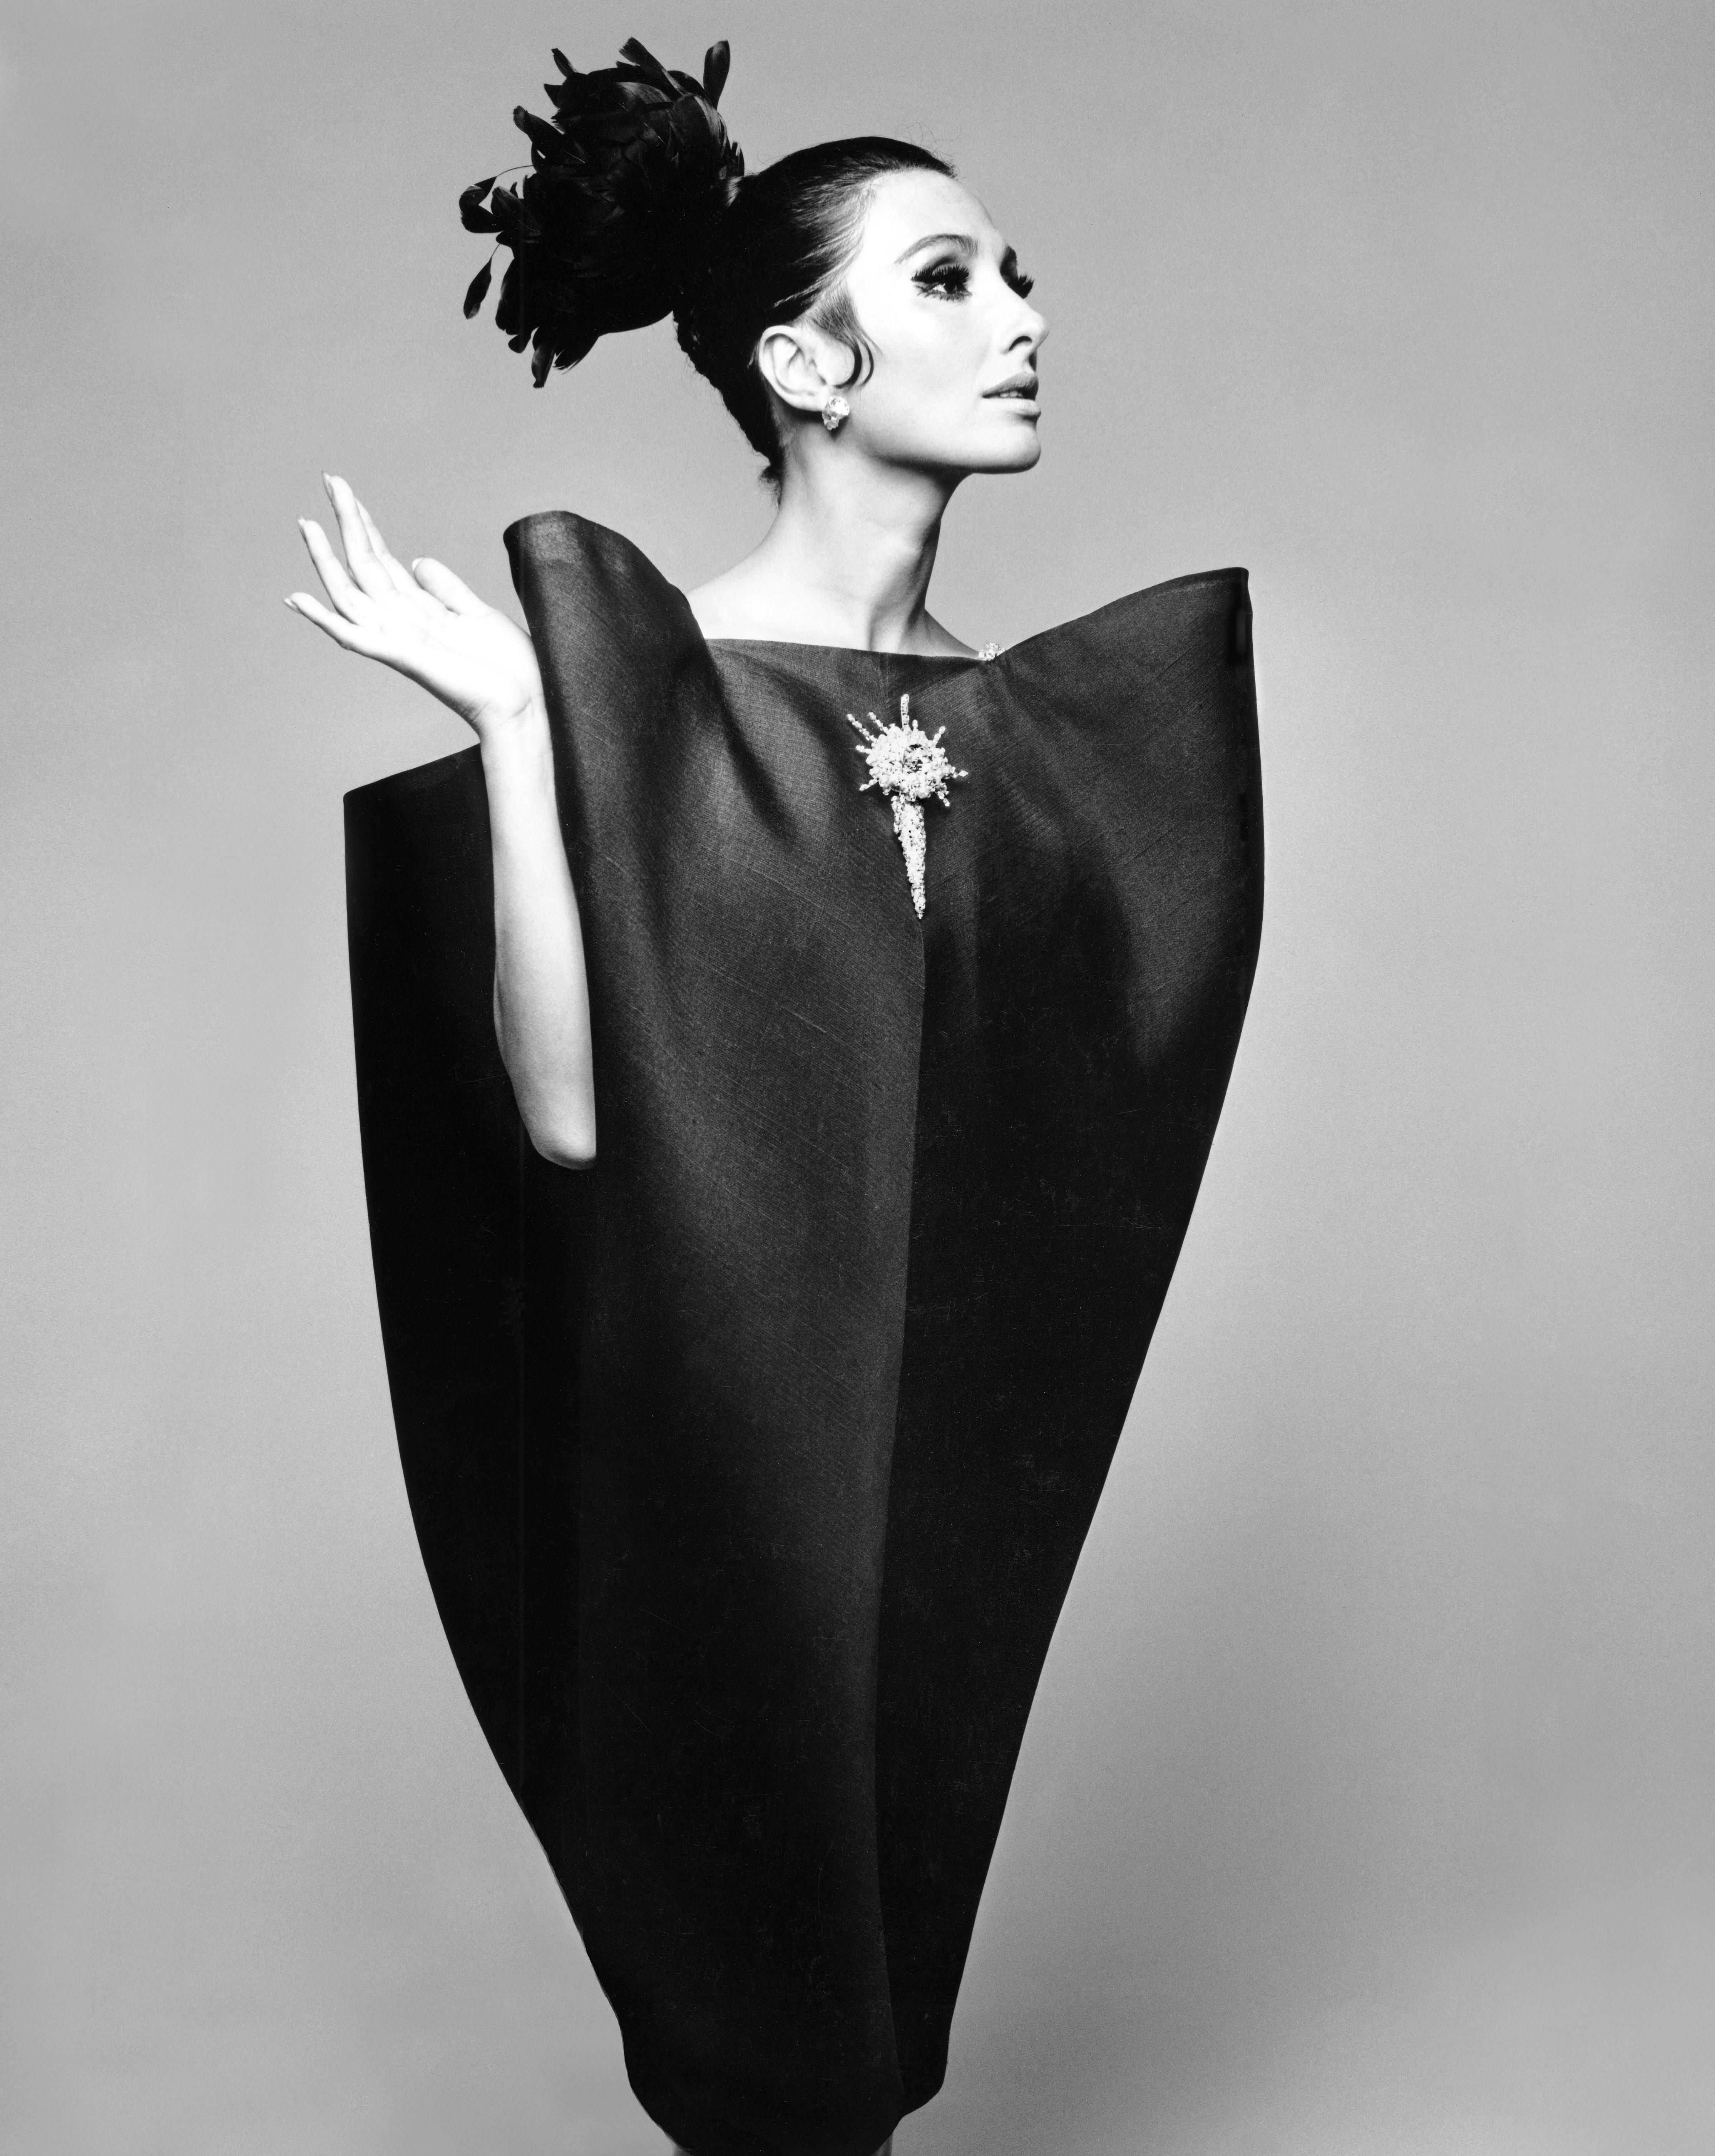 Balenciaga: Shaping Fashion, V&A Museum, London 1